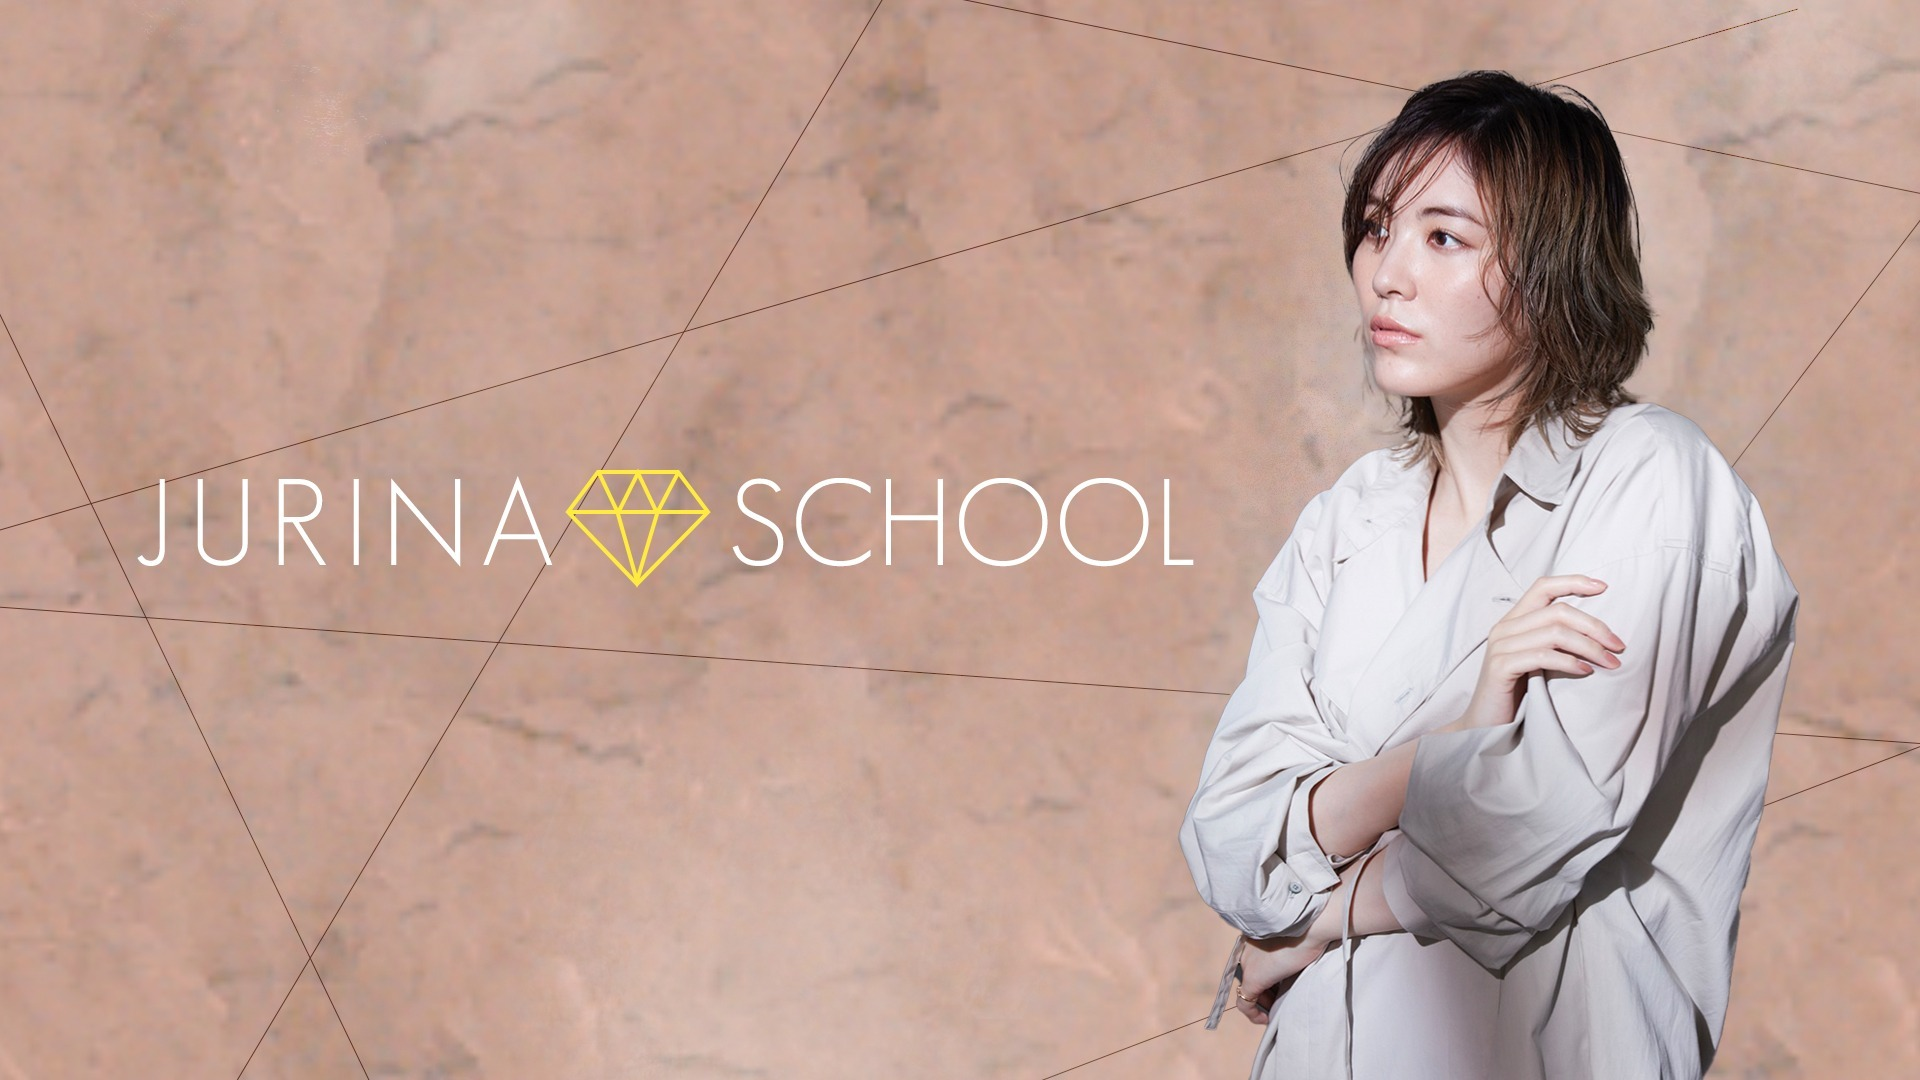 JURINA SCHOOL